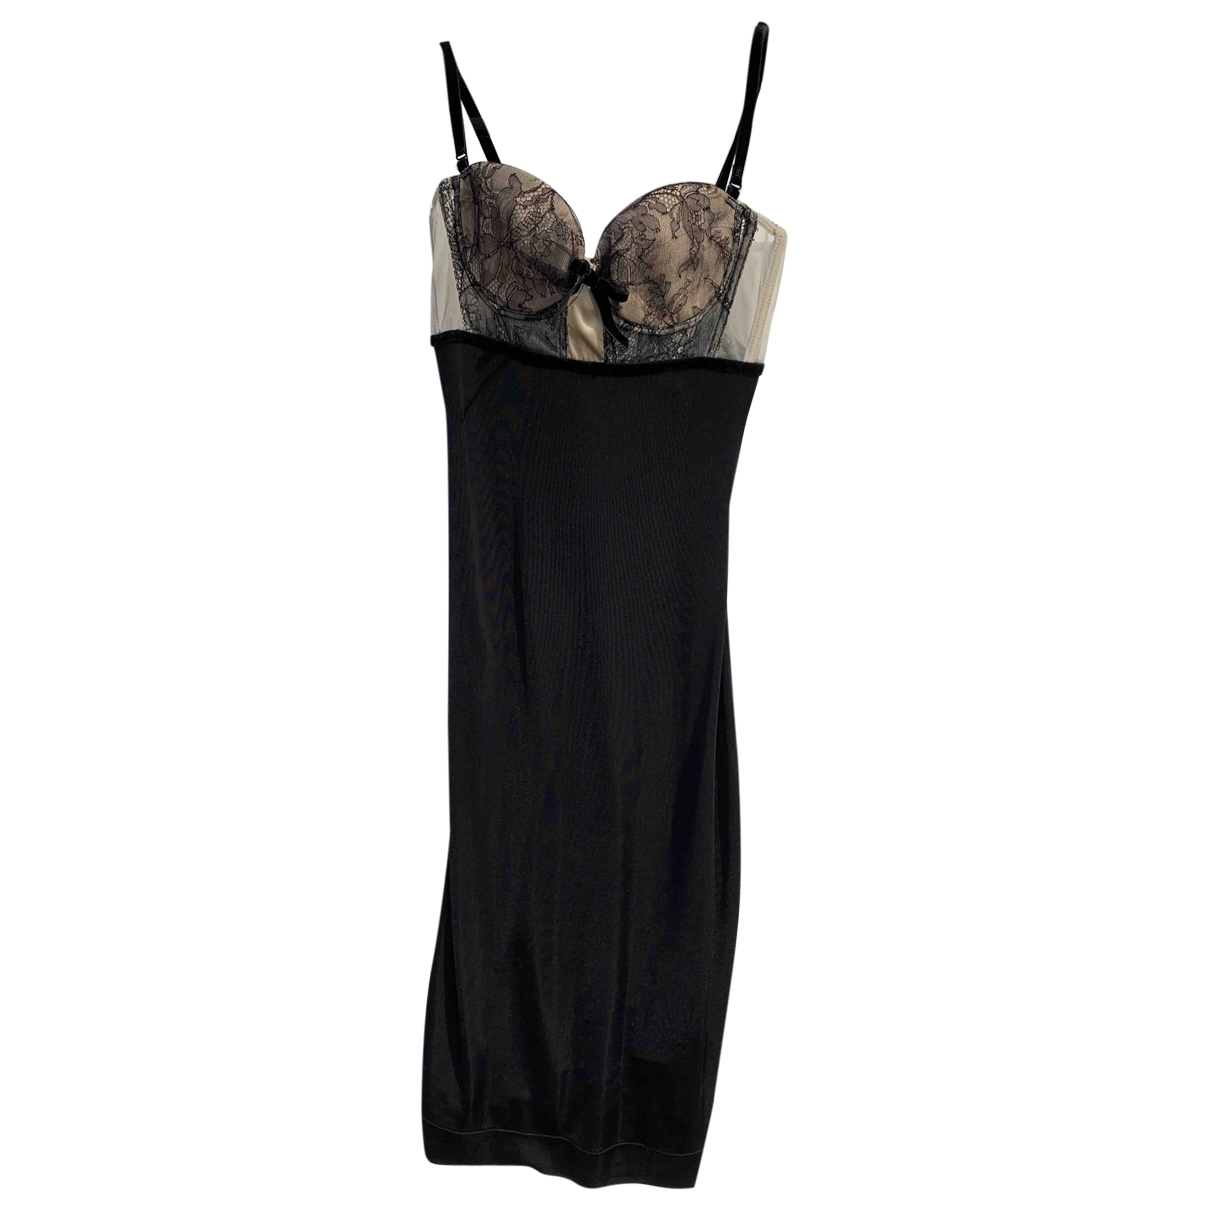 Class Cavalli \N Black dress for Women 38 IT